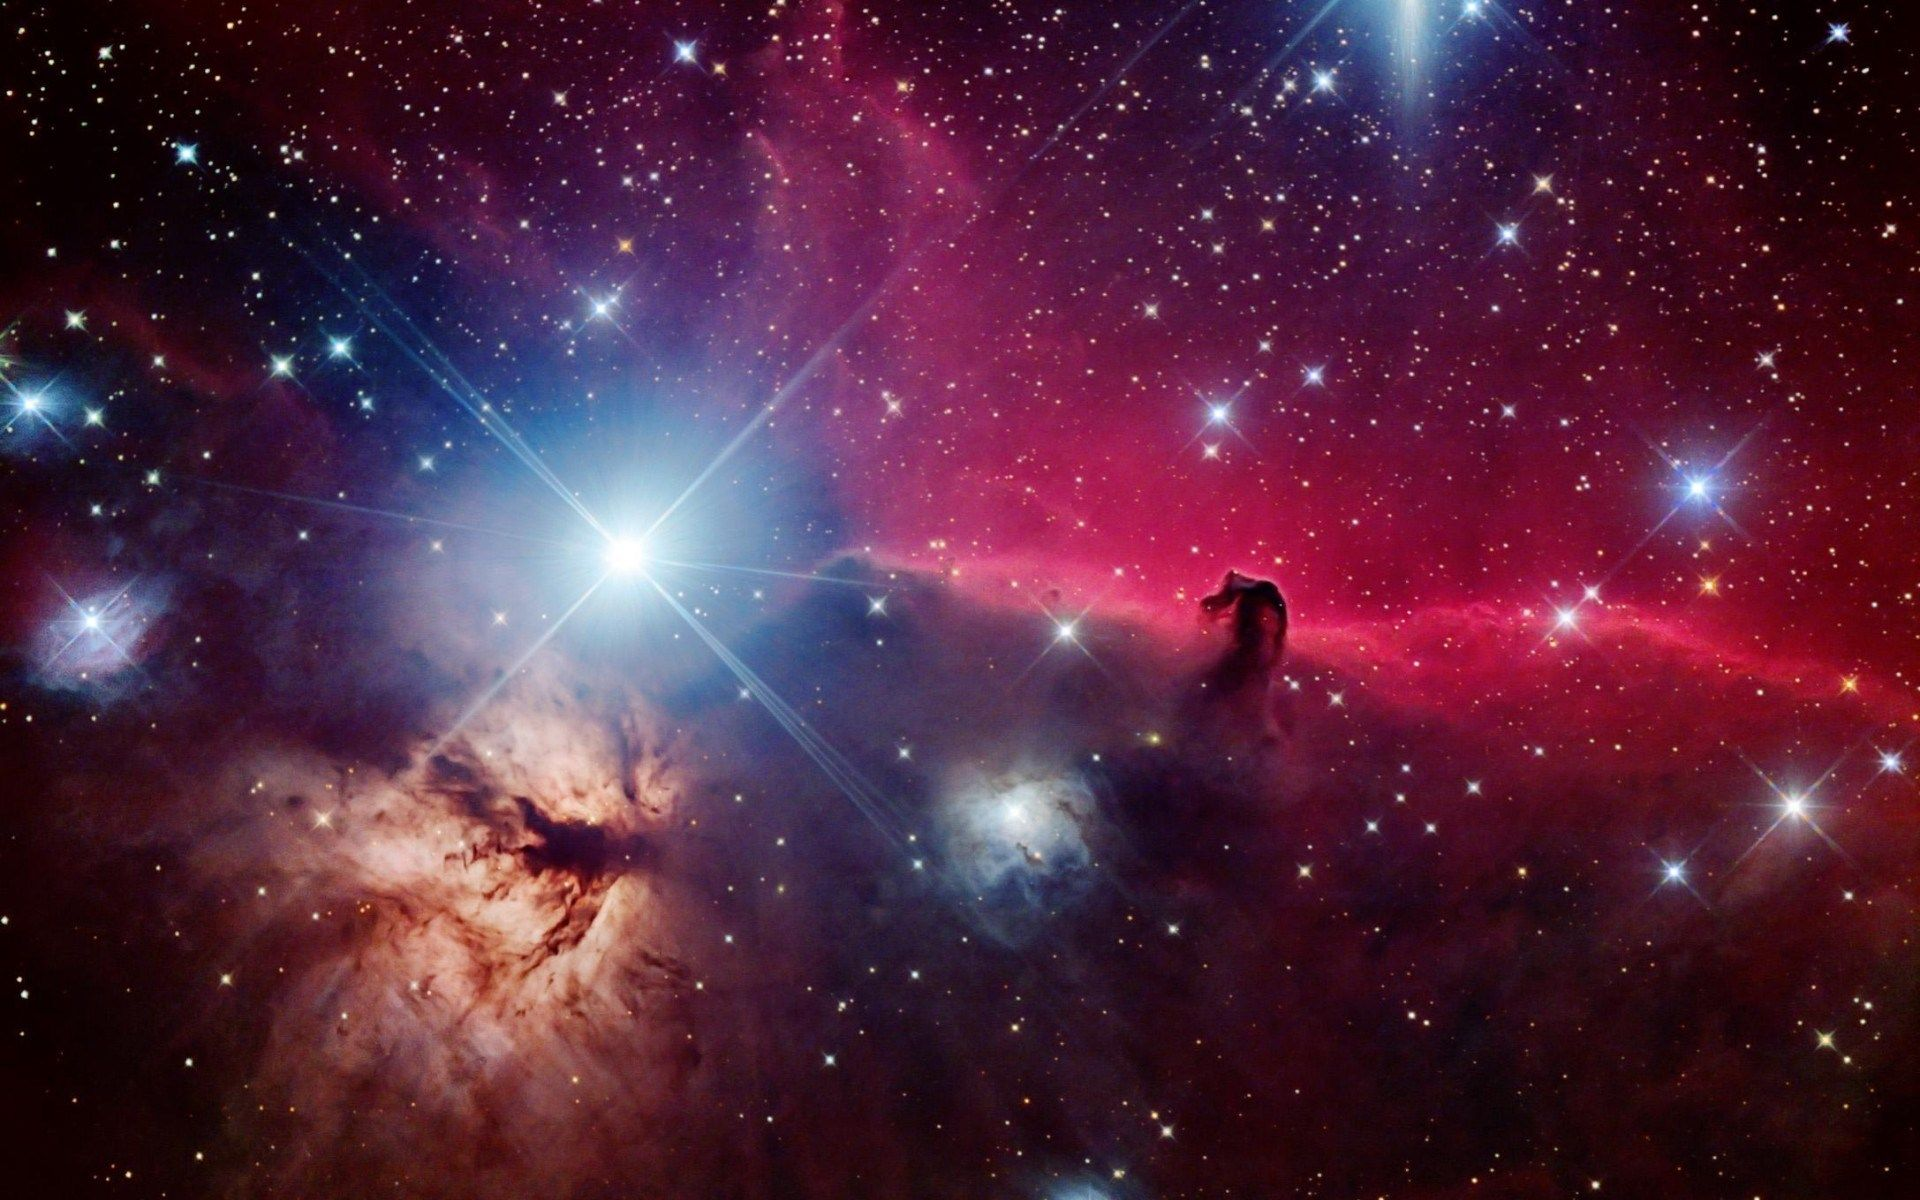 Stars Hd Widescreen Wallpapers